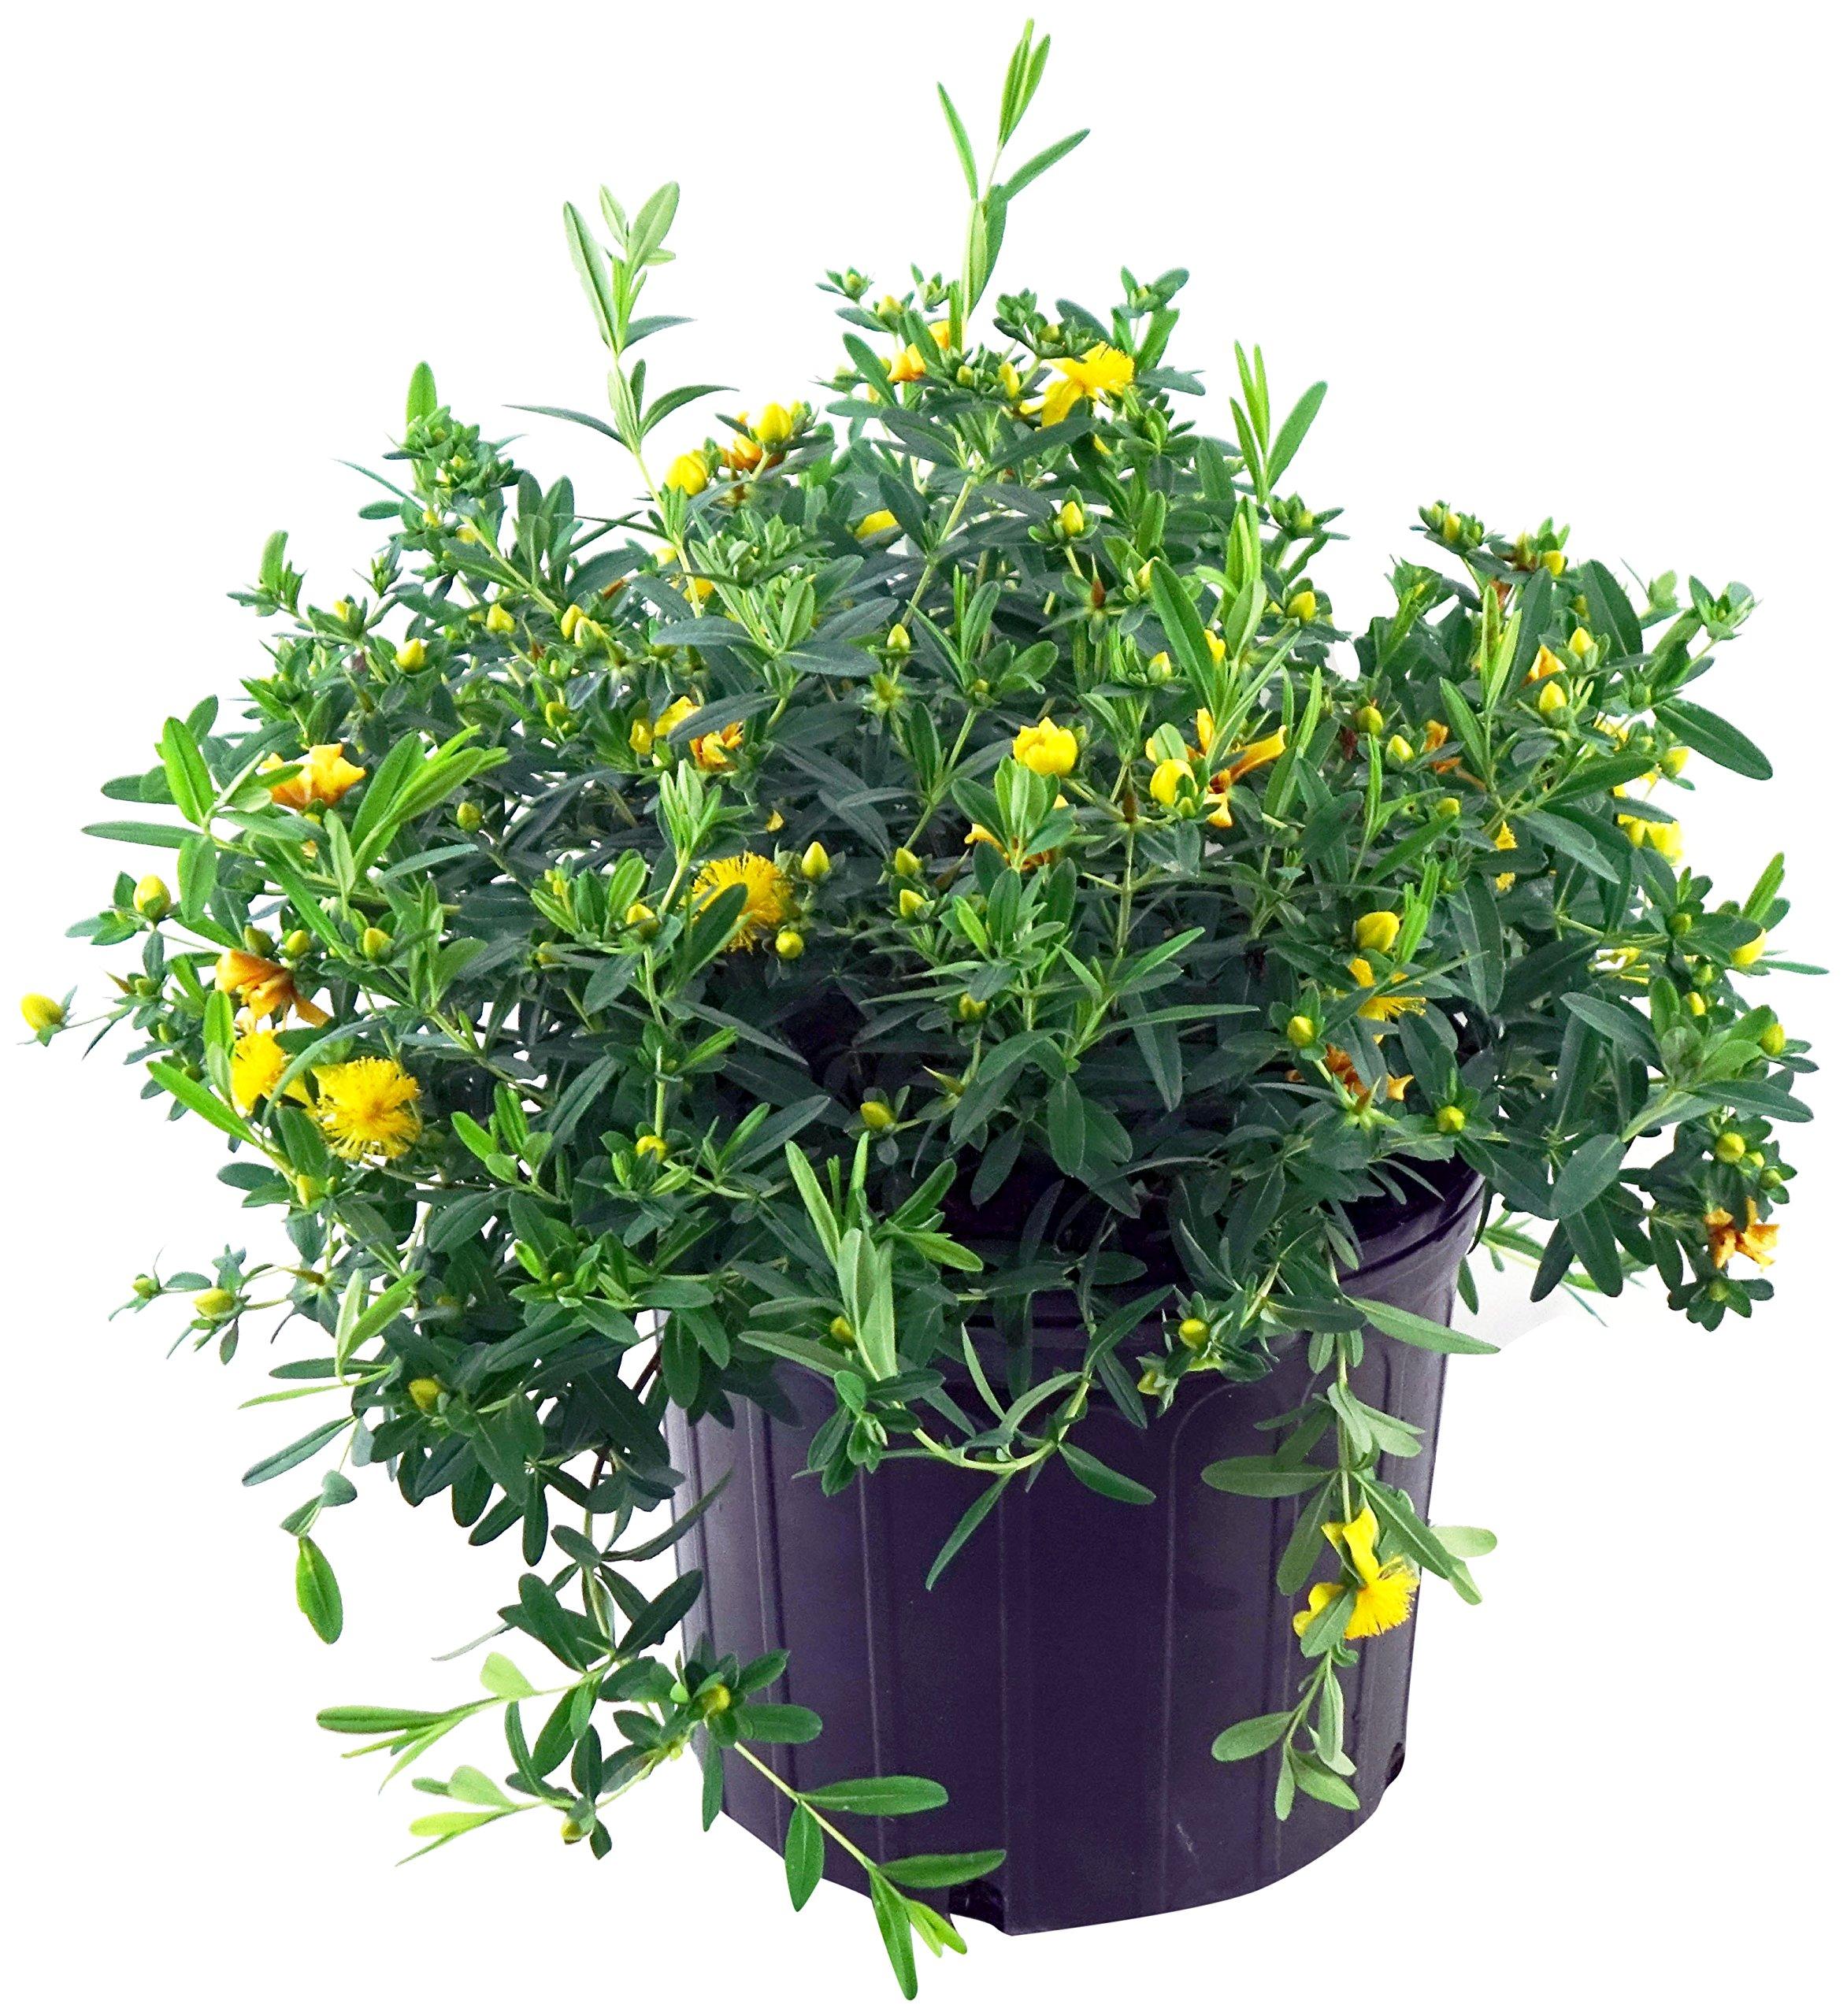 Hypericum frondosum 'Sunburst' (St. Johns Wort) Shrub, yellow flowers, #3 - Size Container